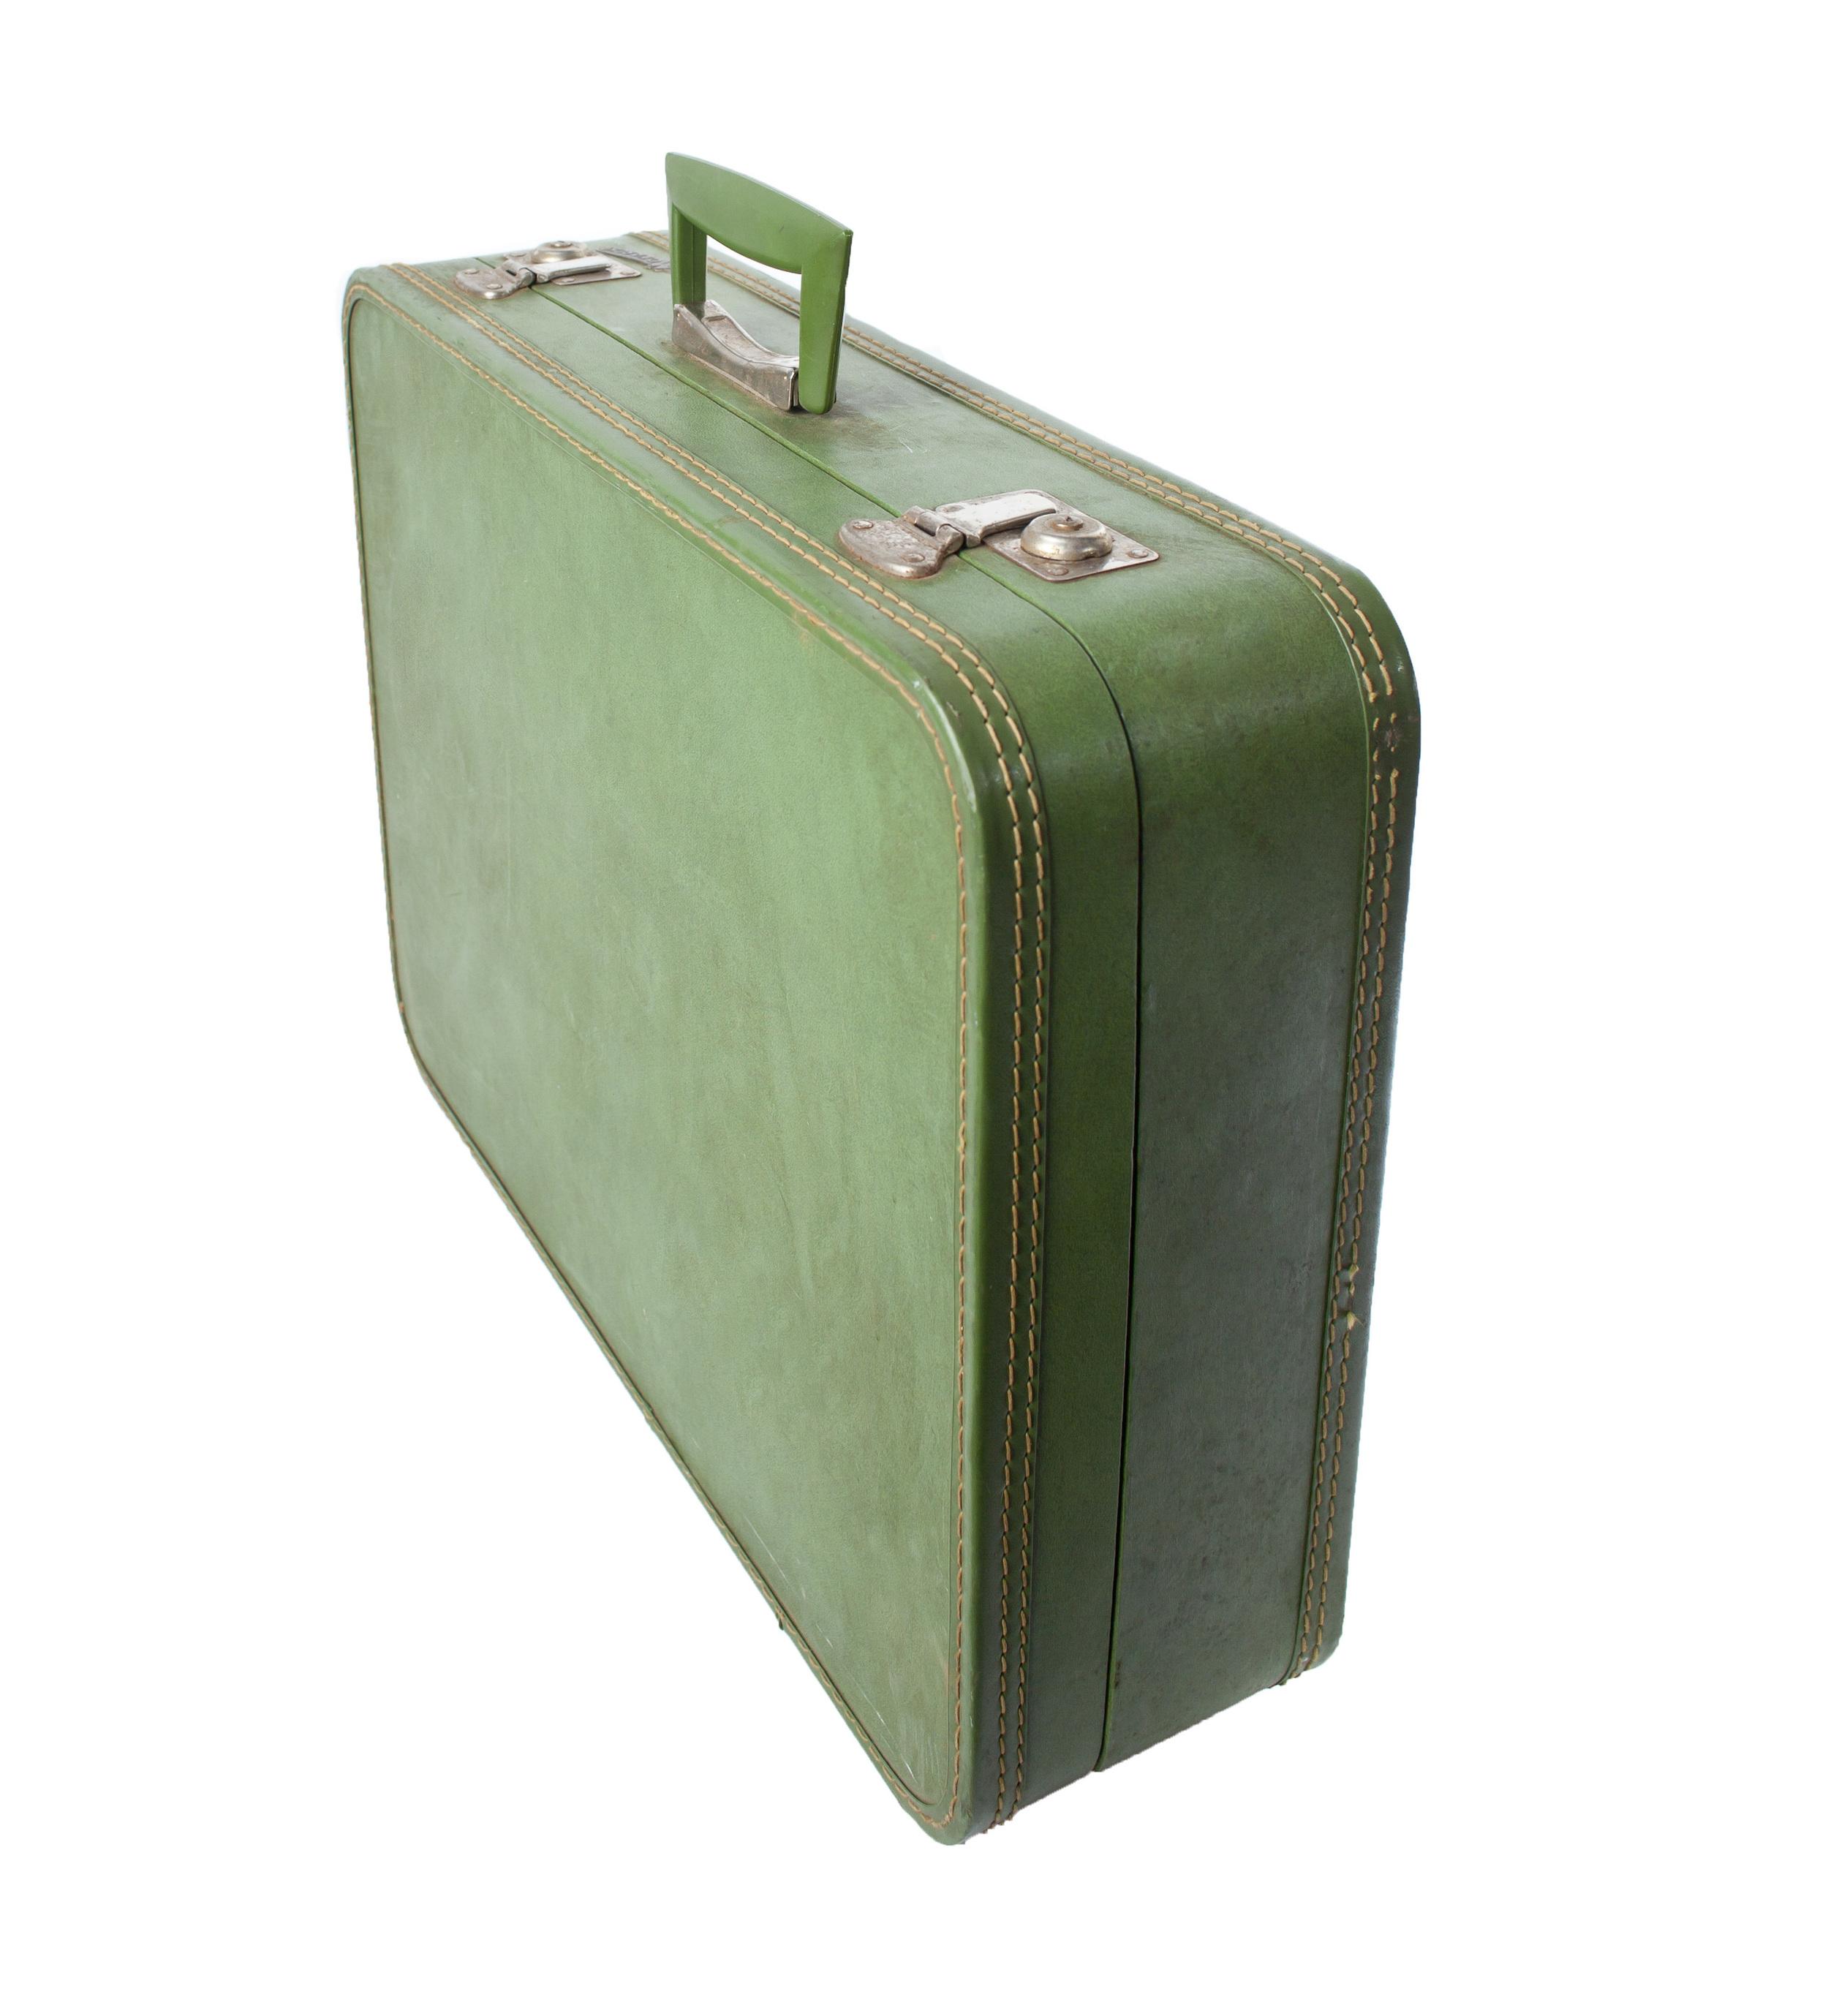 Vintage - Green Suitcase